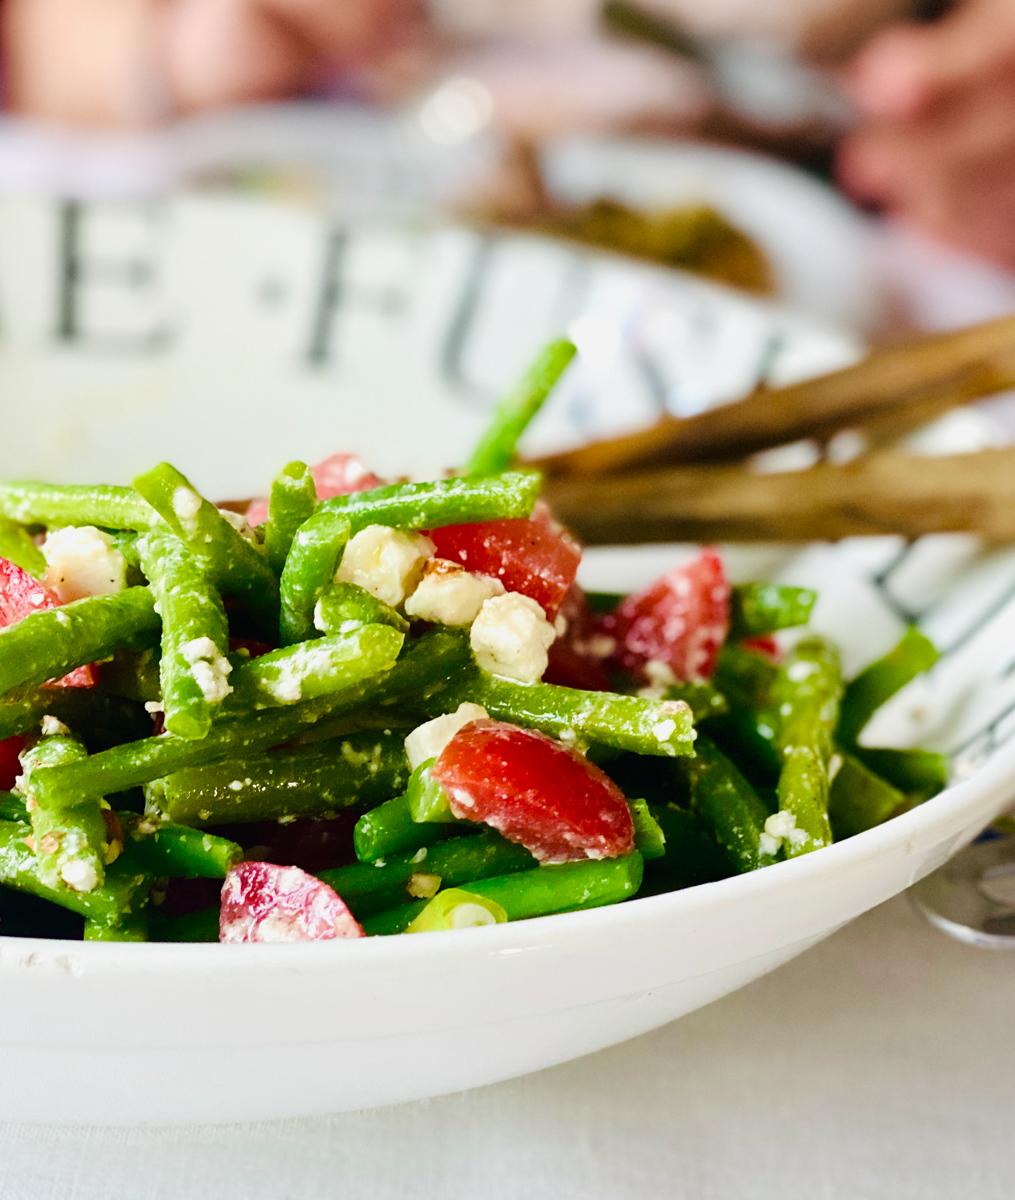 Rezept für Bohnen-Tomatensalat mit Feta | berlinmittemom.com